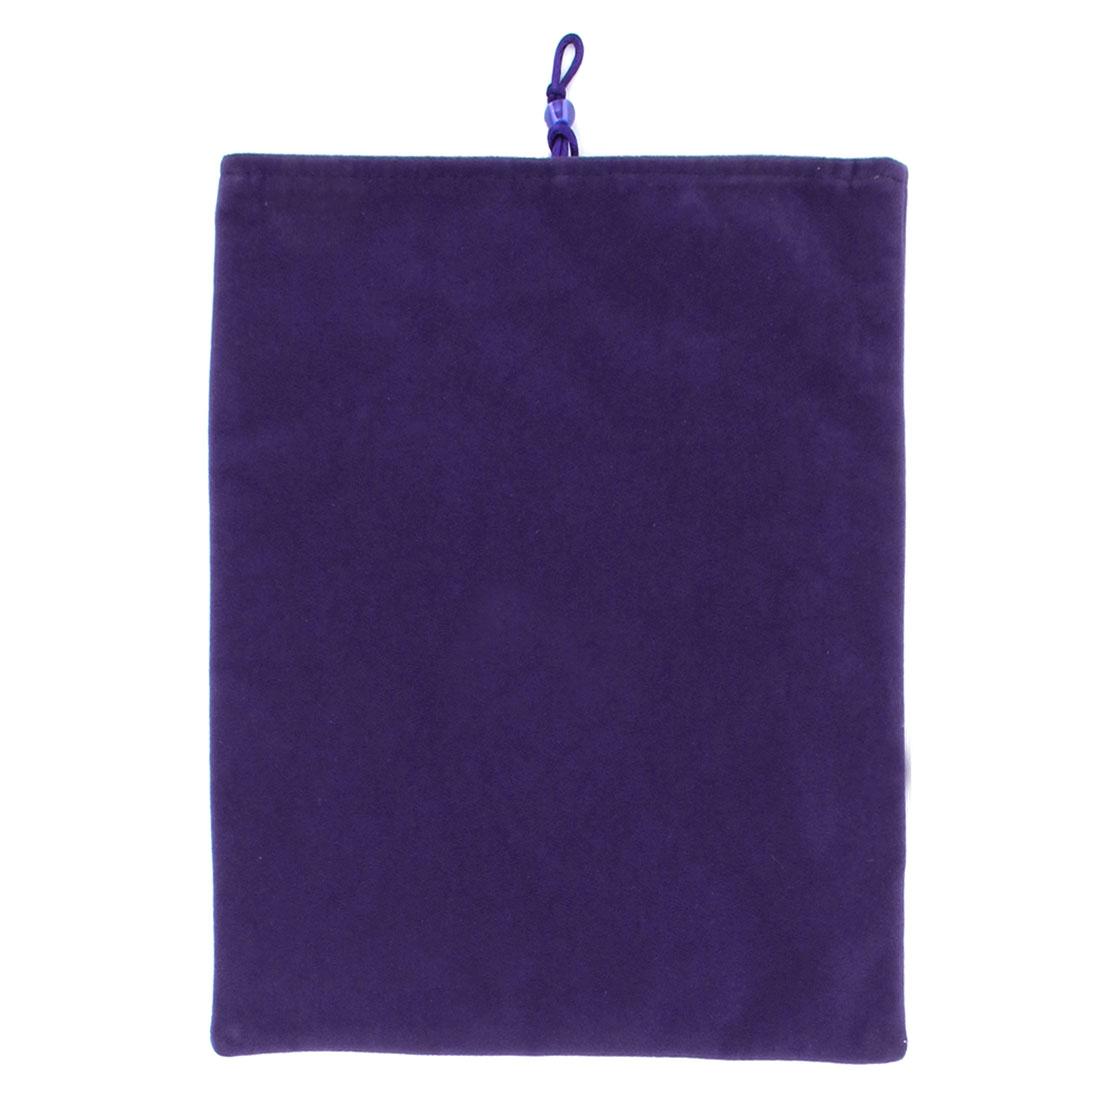 "9.7"" Purple Velvet Sleeve Bag Pouch Case Cover for Computer"